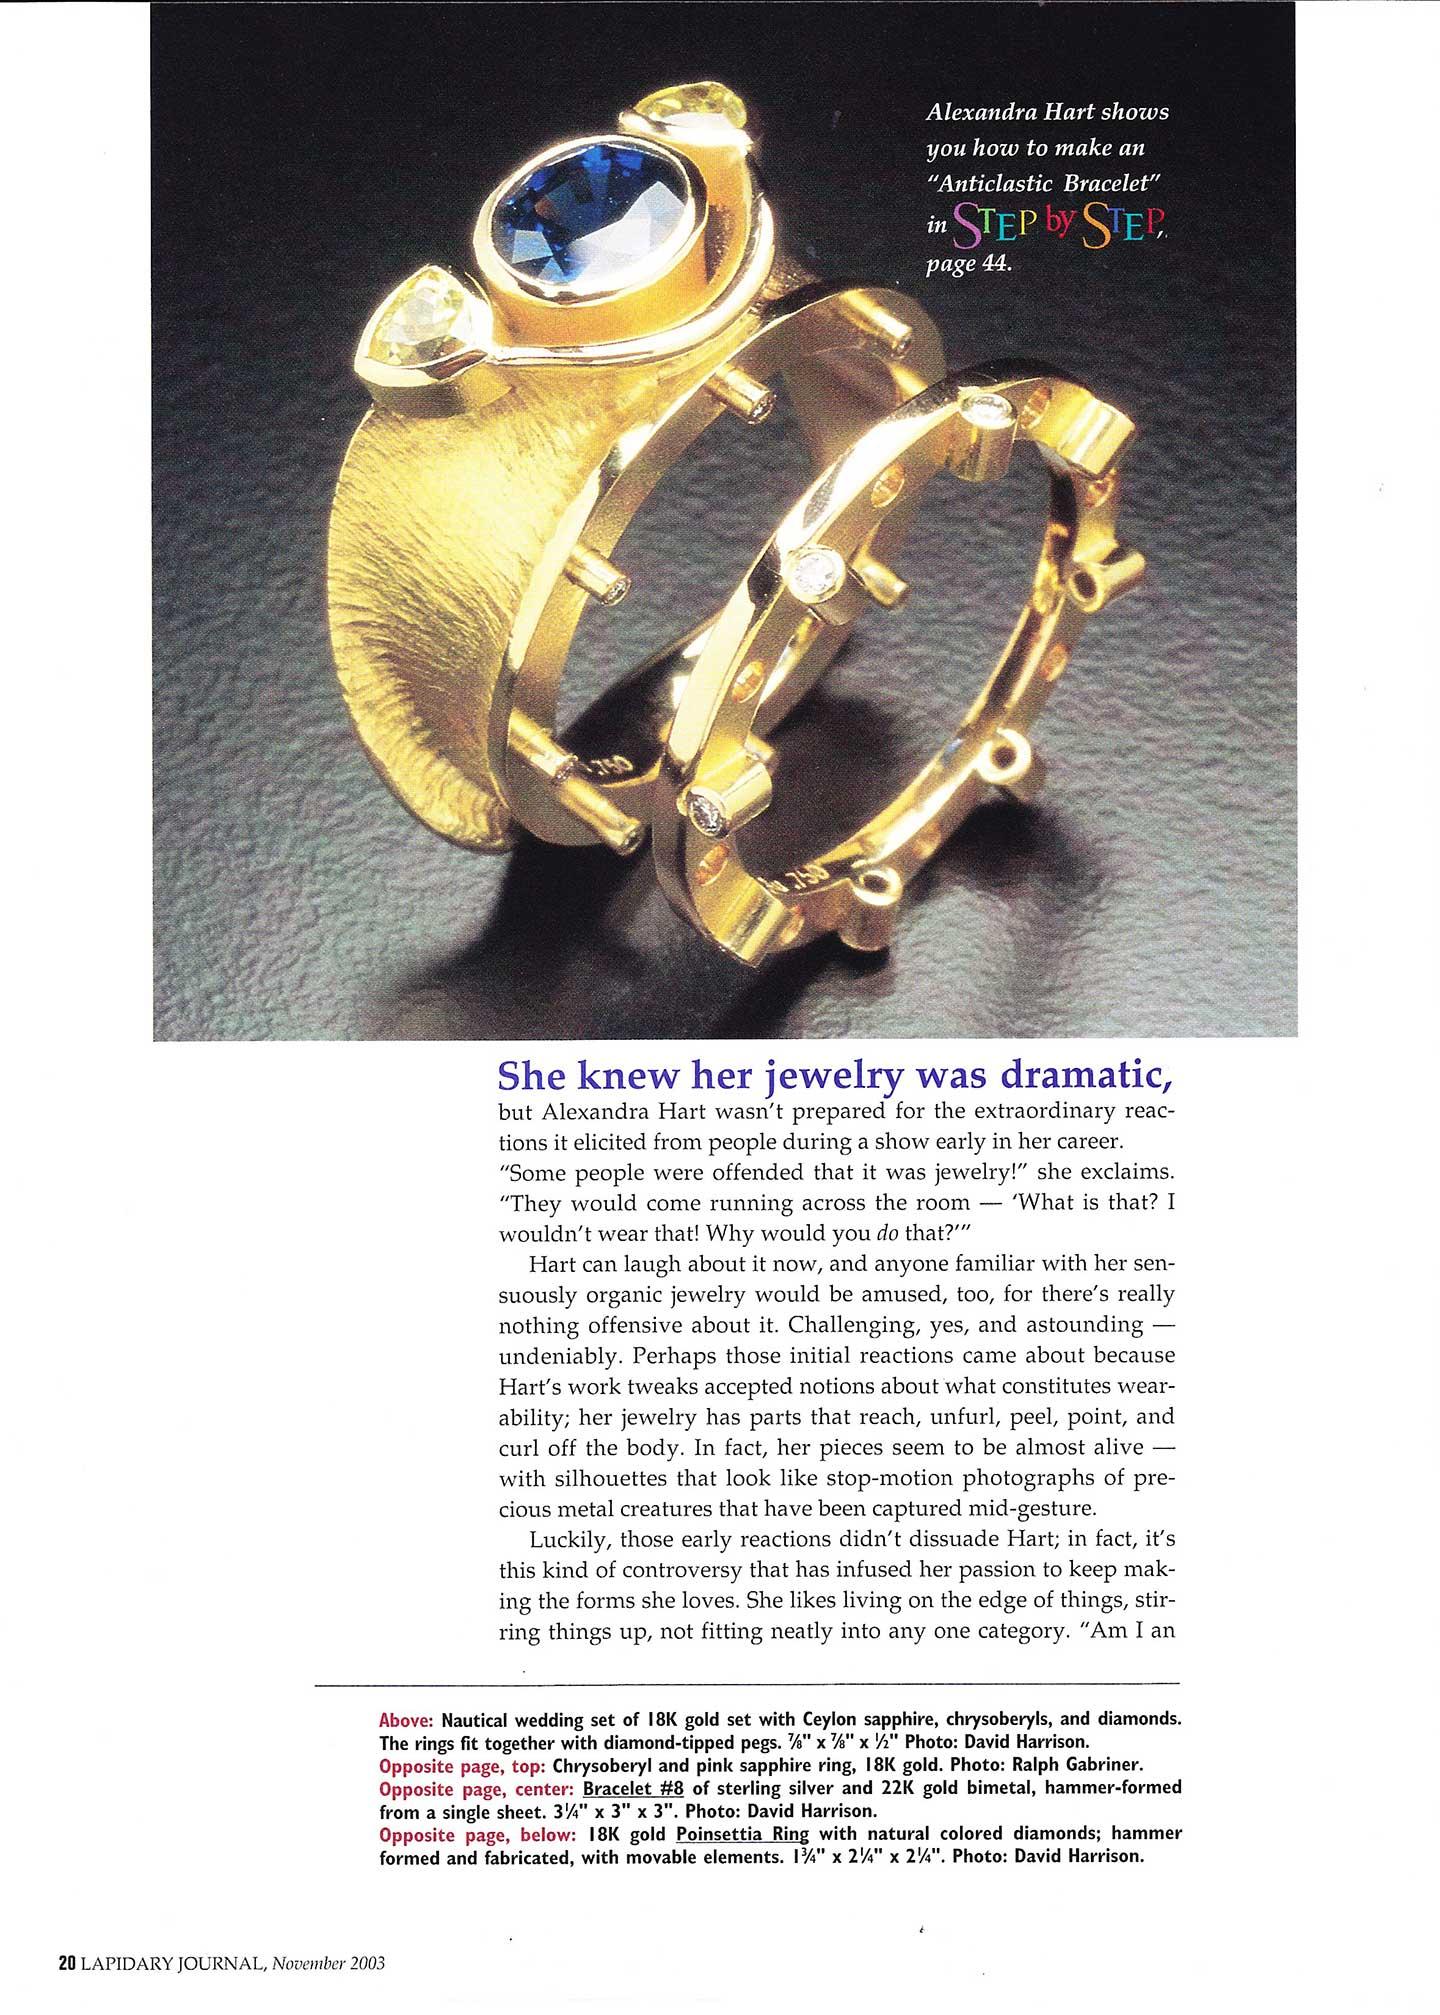 LapidaryJournal-Nov2003-81